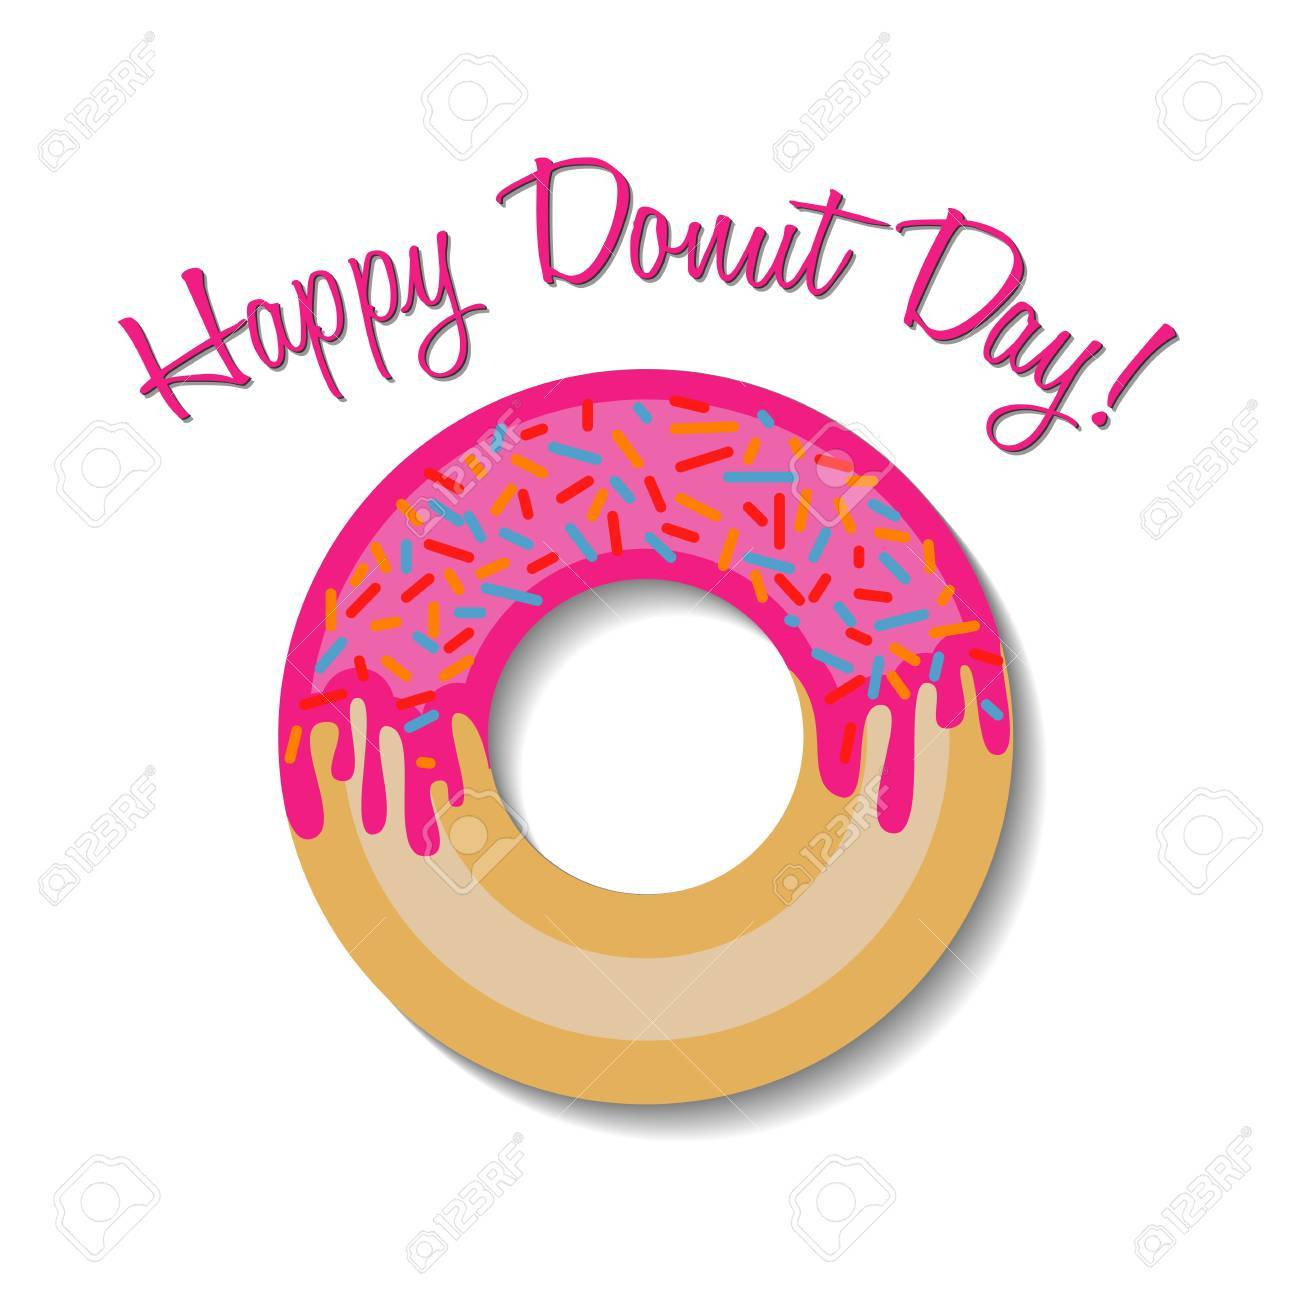 Doughnut clipart happy donut. X free clip art